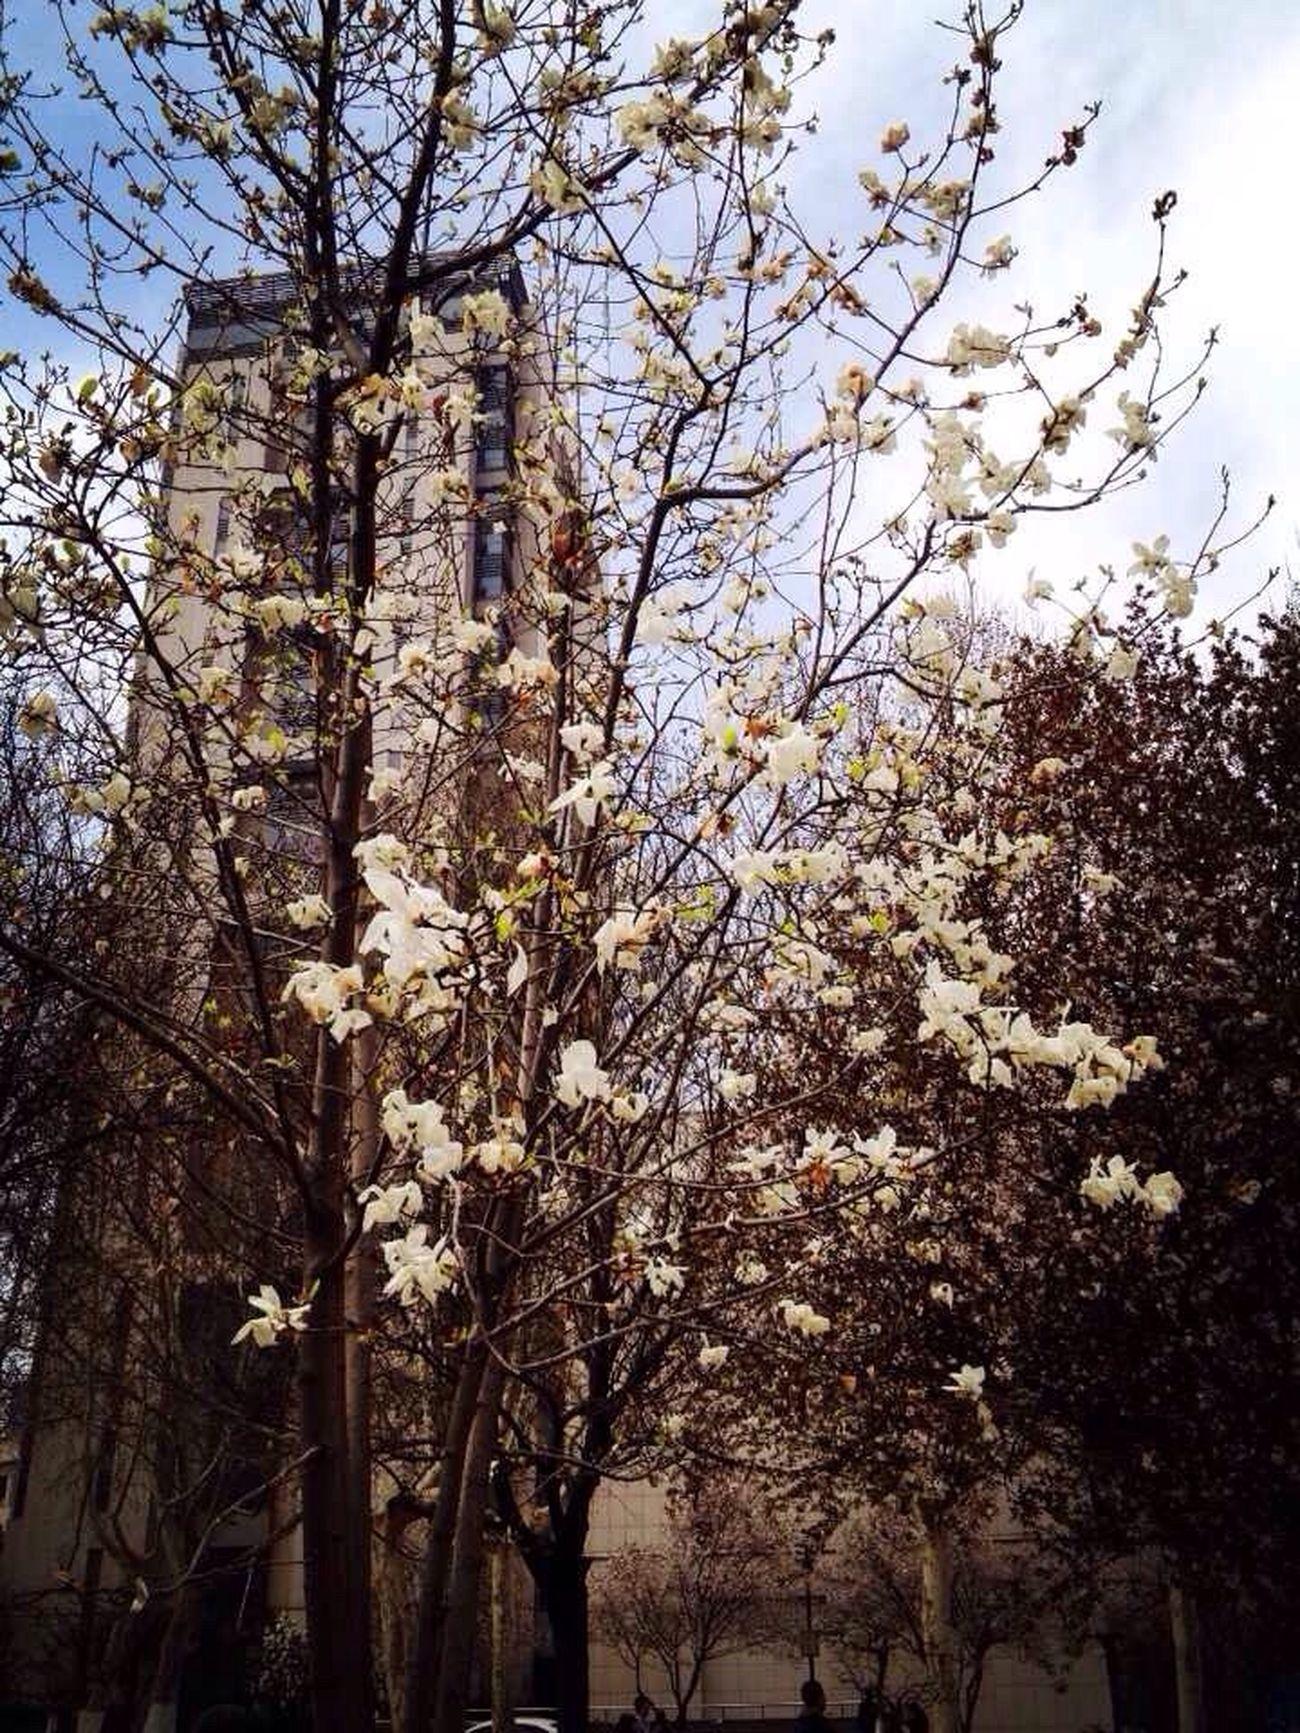 Spring Sakura (˃᷄ꇴ˂᷅ ૂ๑)